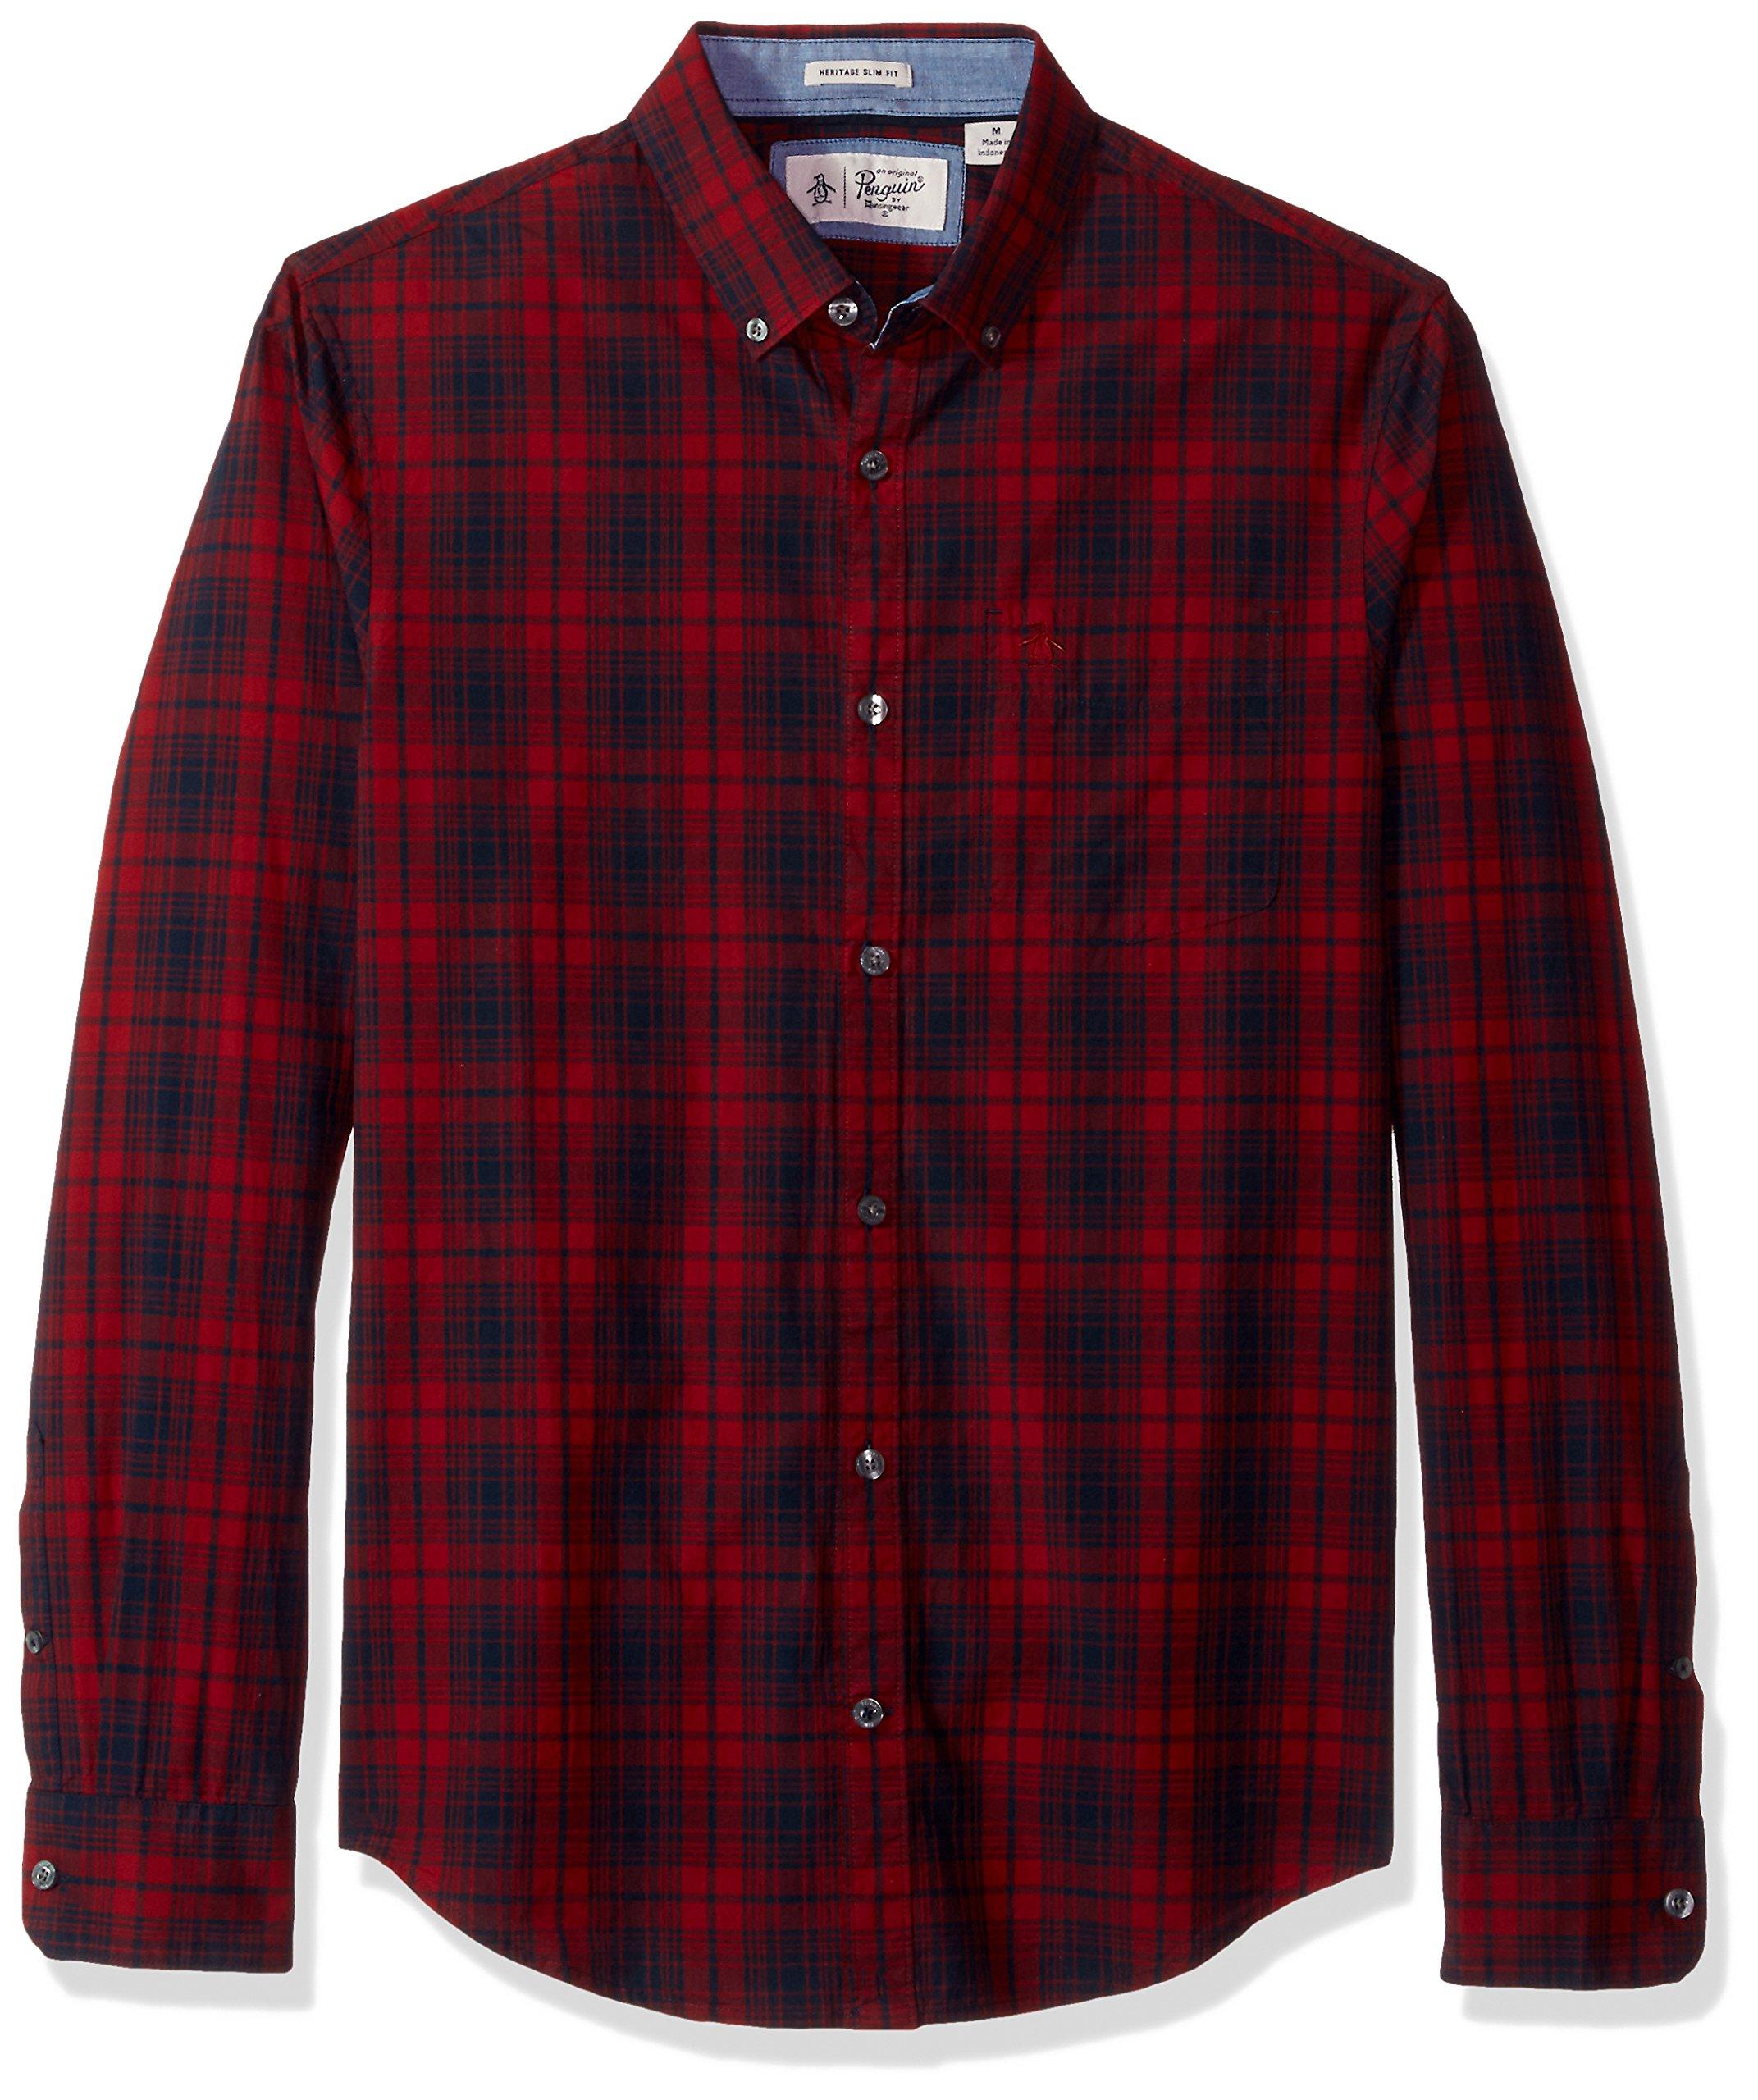 Original Penguin Men's P55 Plaid Shirt, Pomegranate, Large